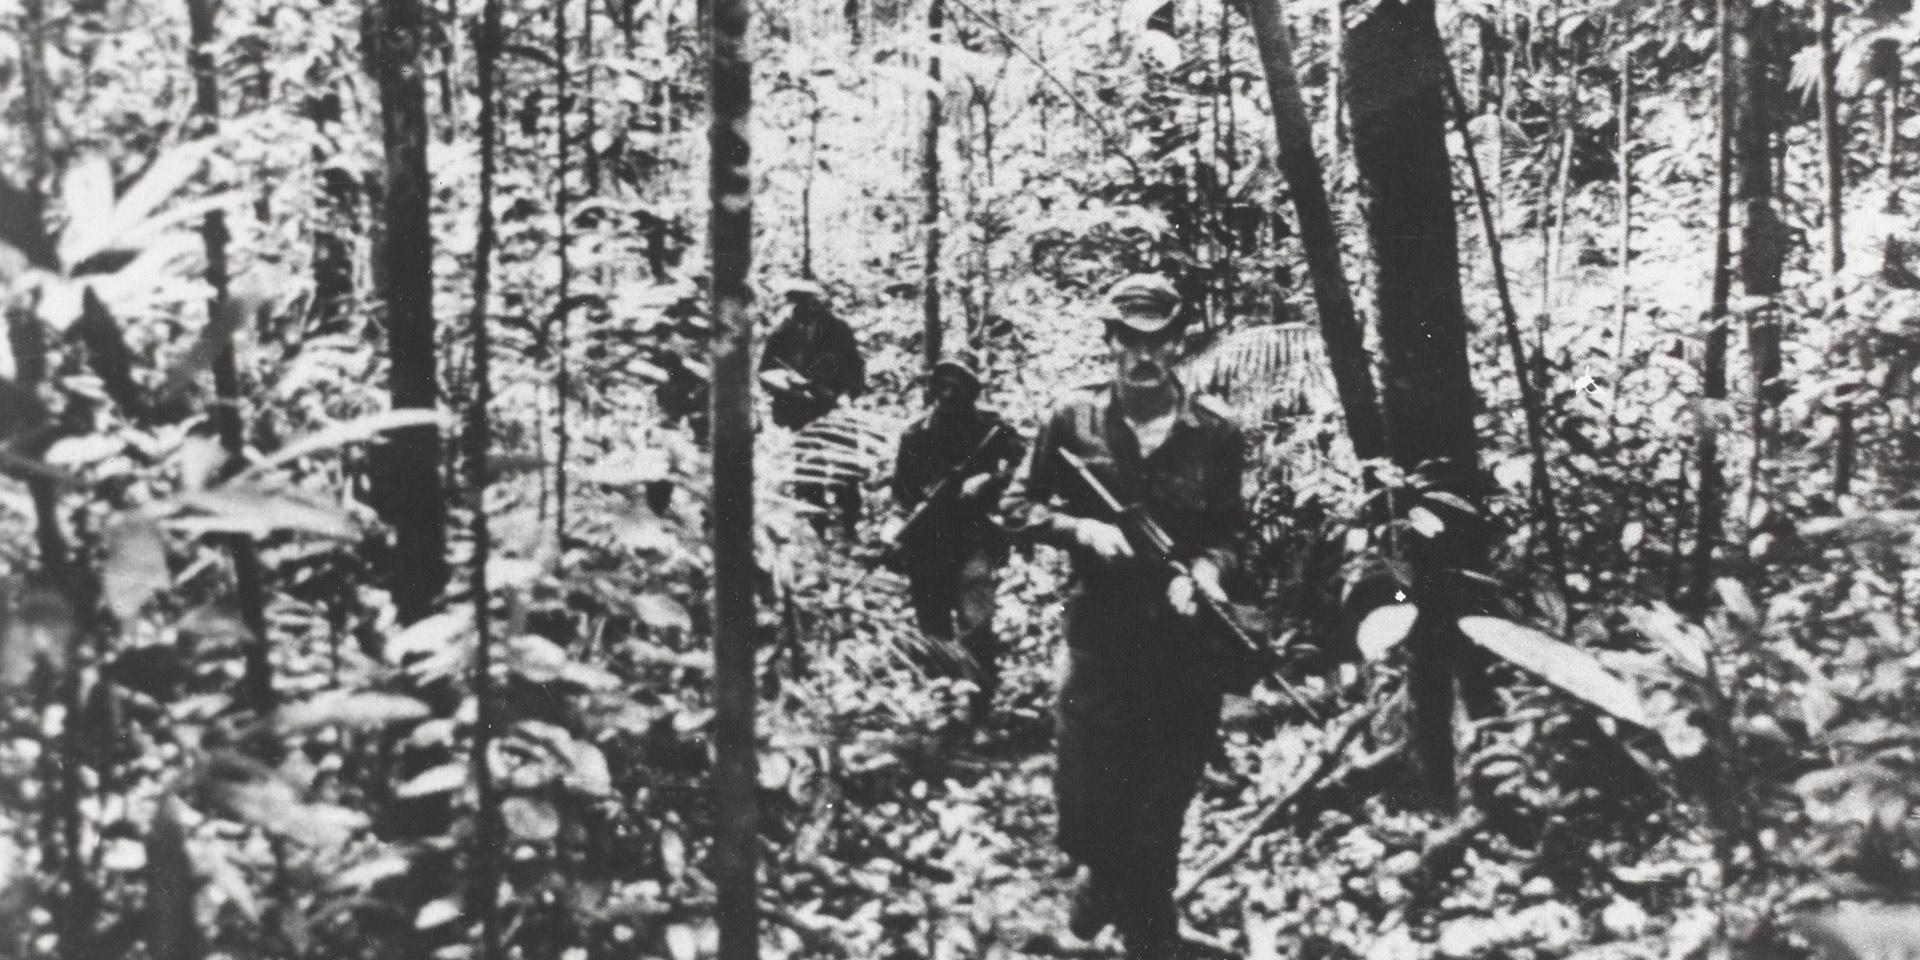 On patrol in the jungles of North Borneo, c1964